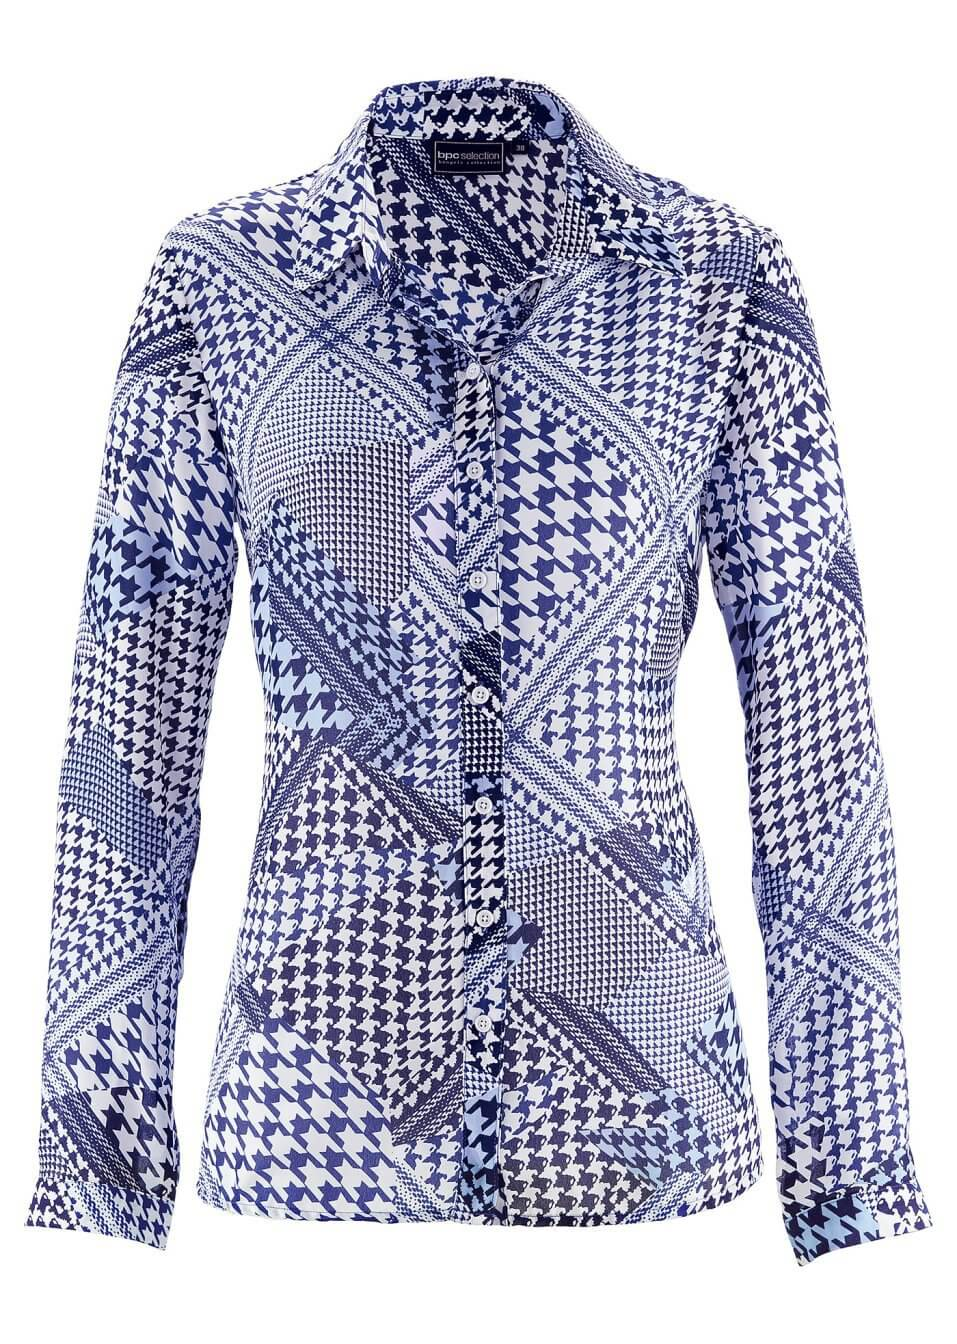 Koszula-krata